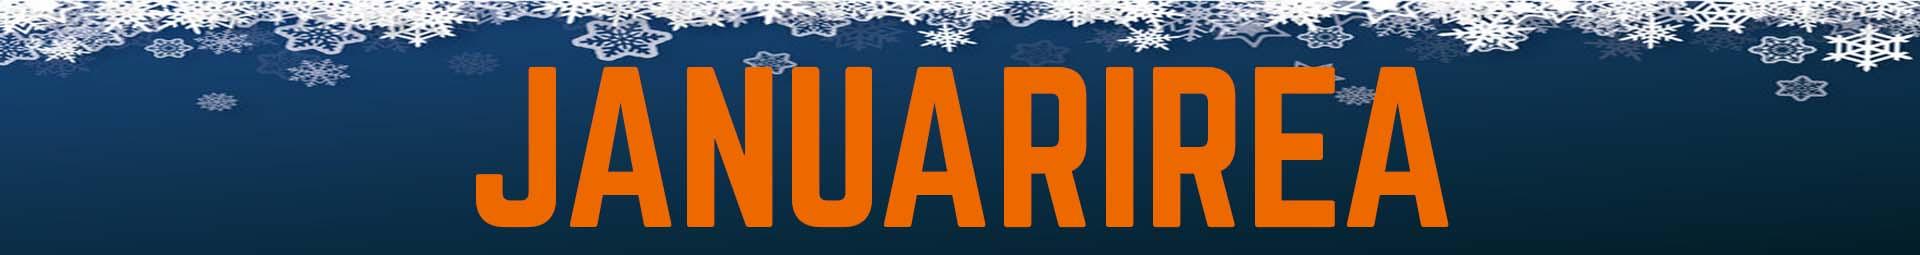 JANUARIREA 2020